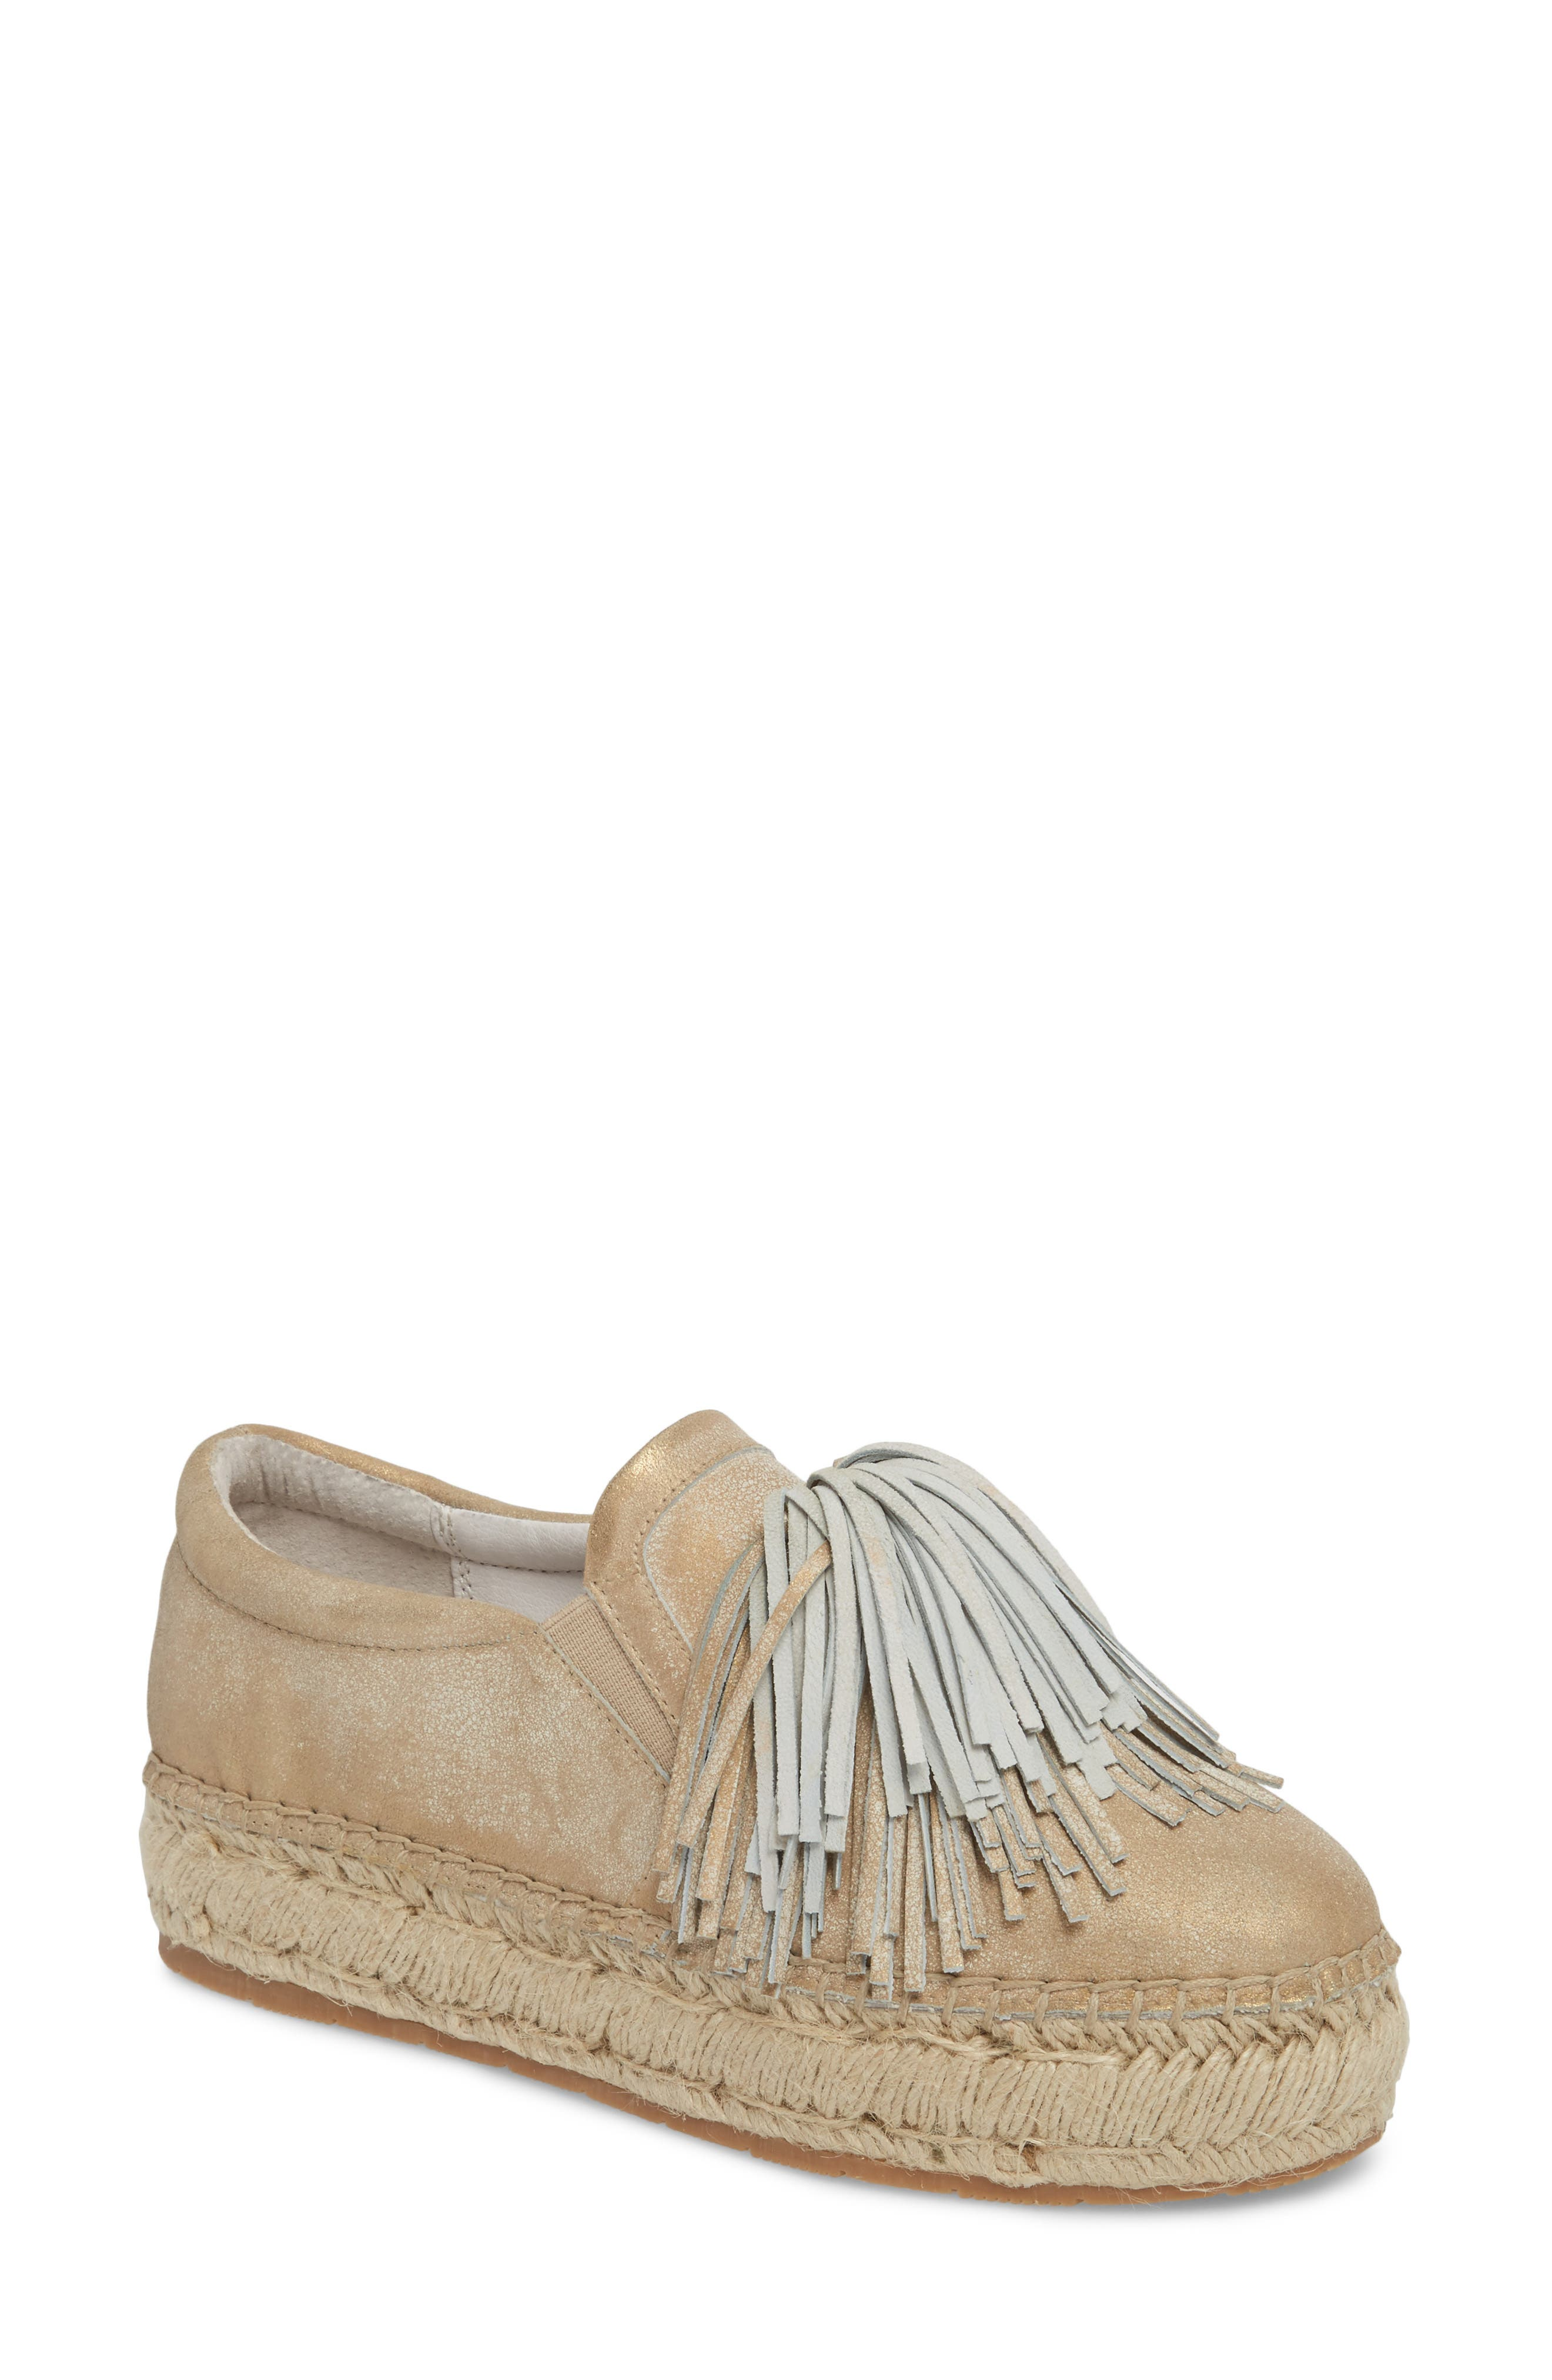 Raoul Espadrille Sneaker,                             Main thumbnail 1, color,                             Bronze Leather